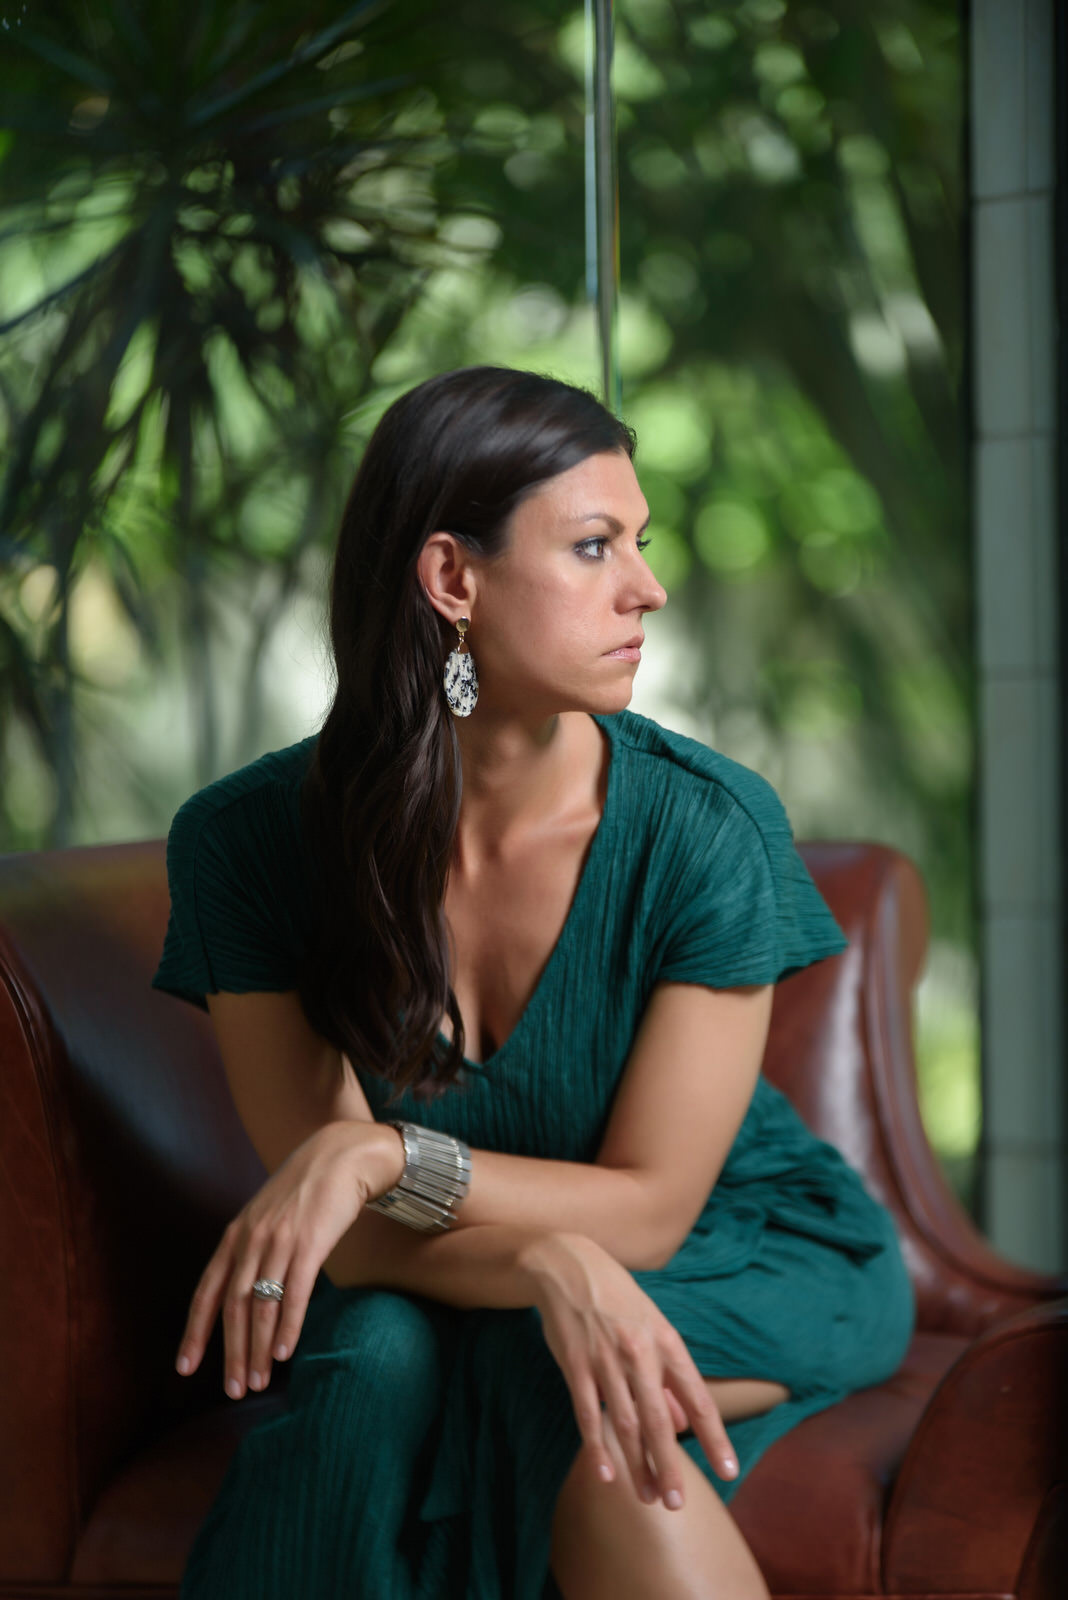 Sara Longoria Sitting